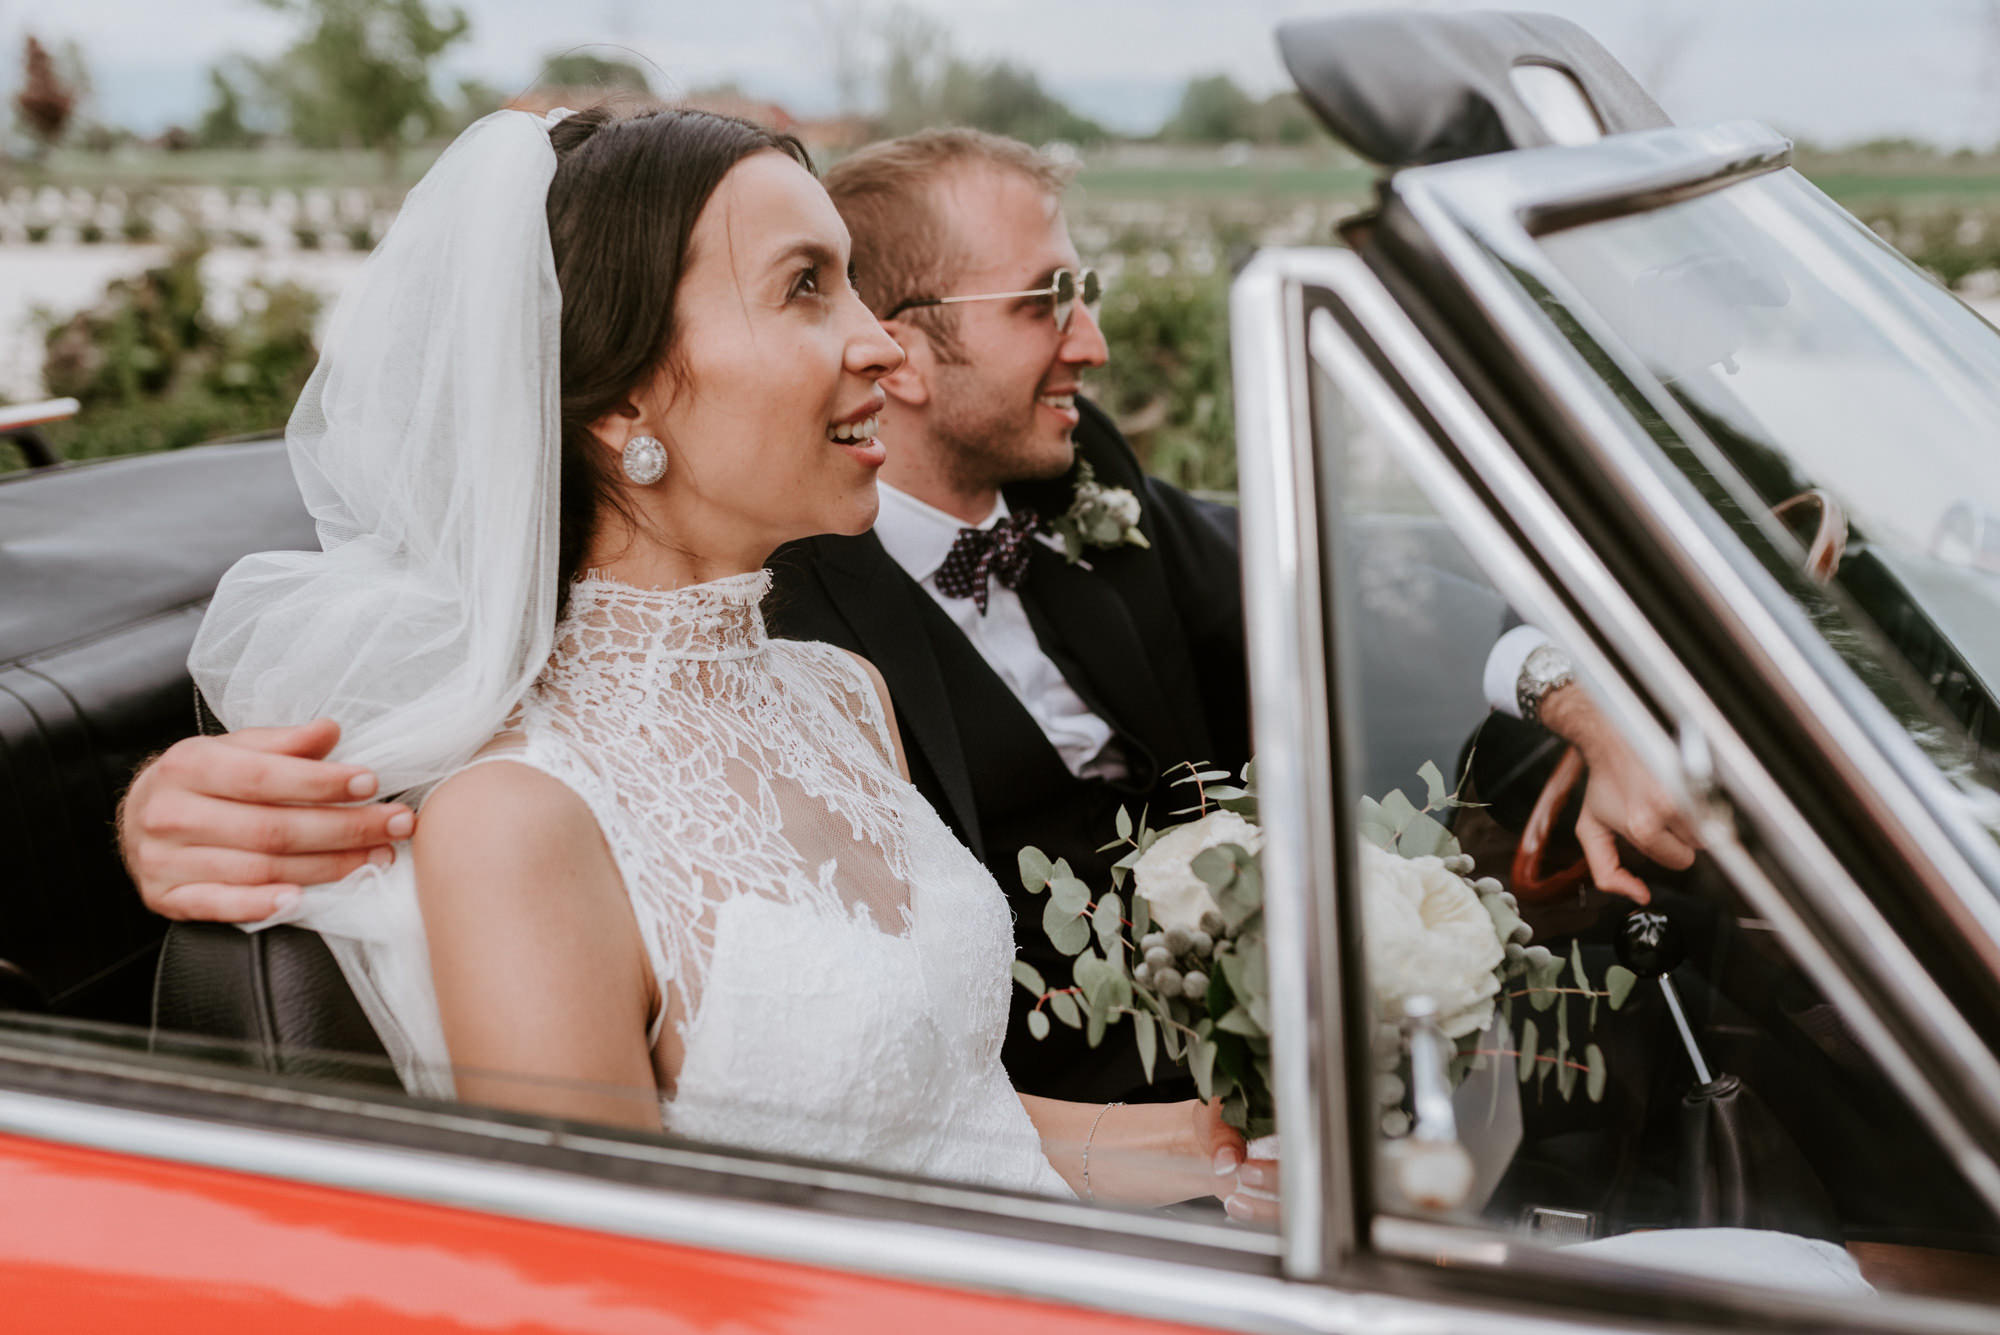 FOTO+PHOTO+BODA+WEDDING+ITALIA+ITALY+MAURICIO+GARAY+MAURICIOGARAY+WEDDINPHOTOGRAPHER+FOTOGRAFODEBODA-1345.jpg